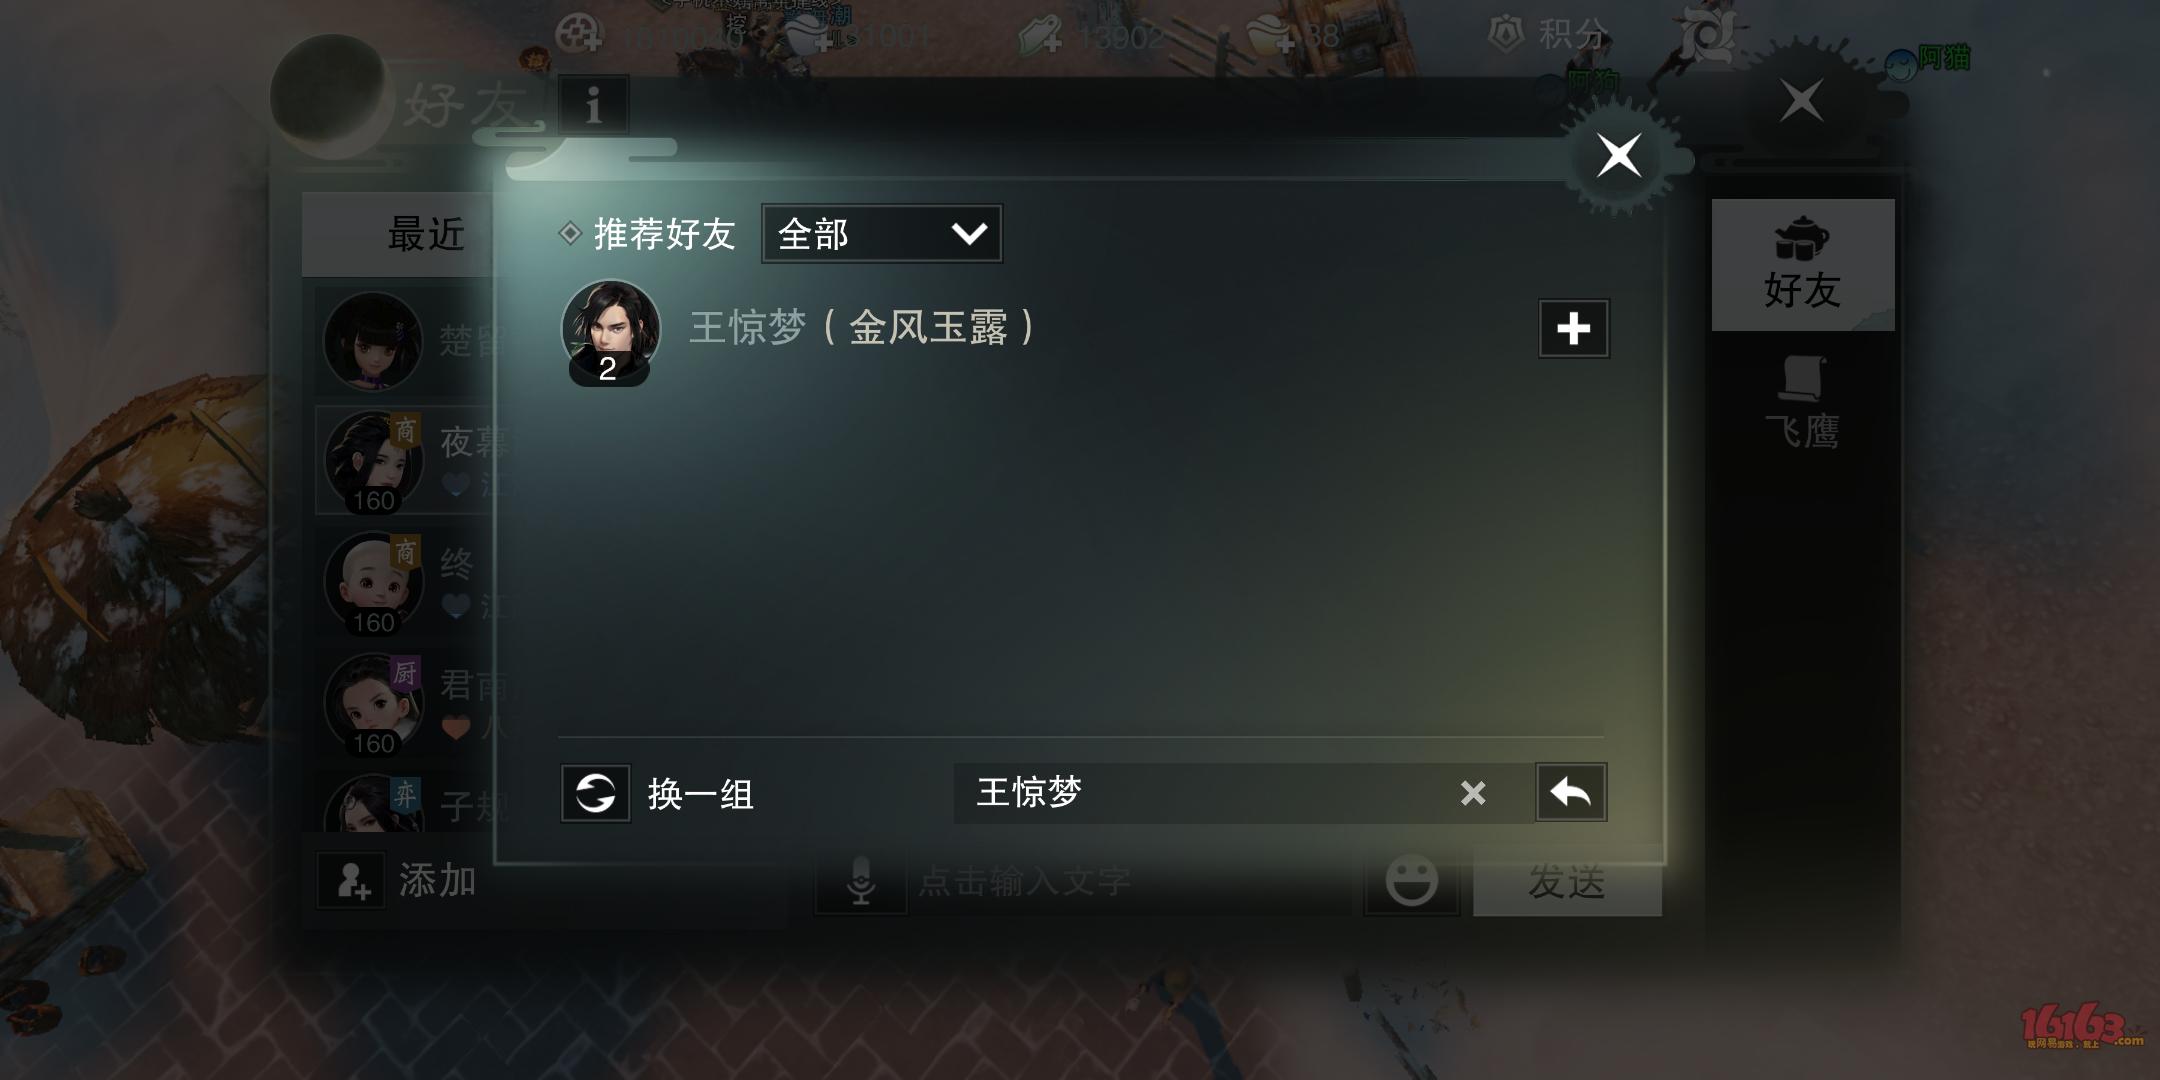 Screenshot_2018-10-12-09-36-46-98.png